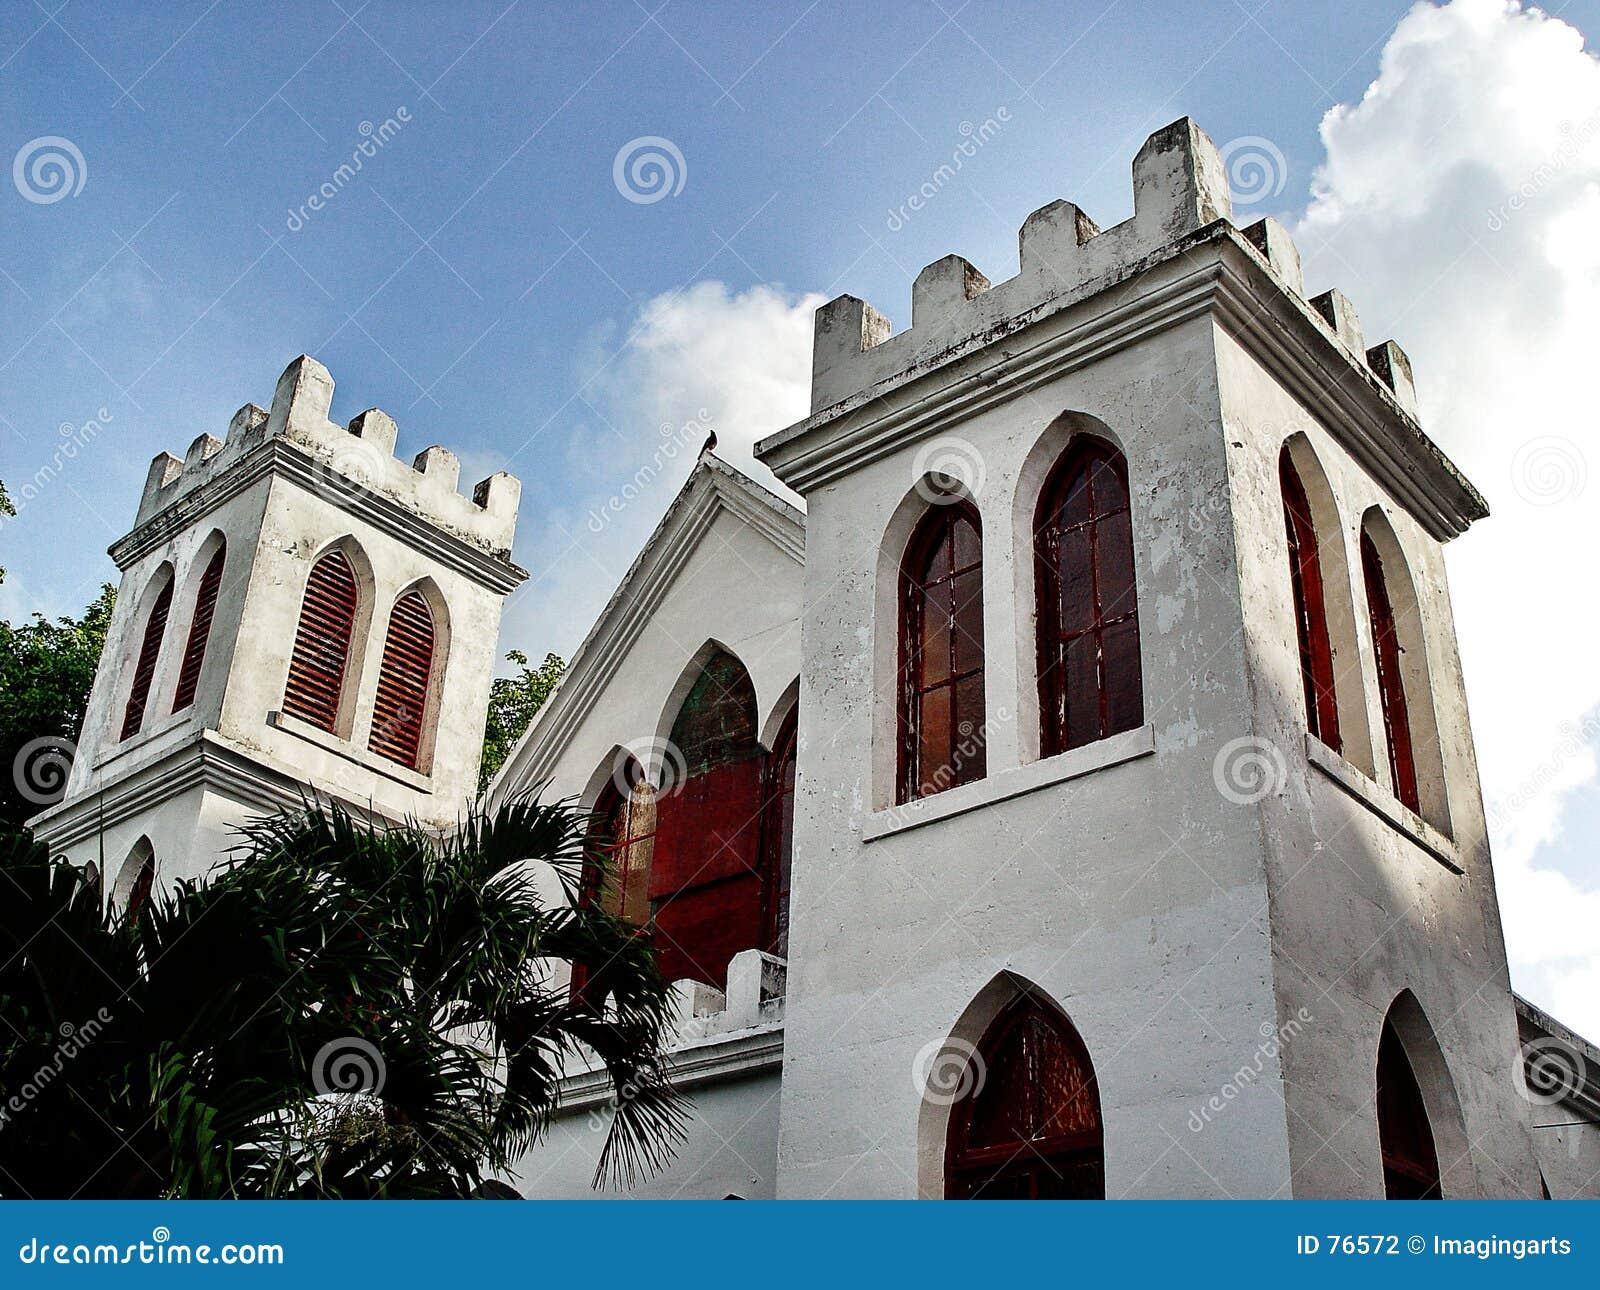 Key- Westkirche